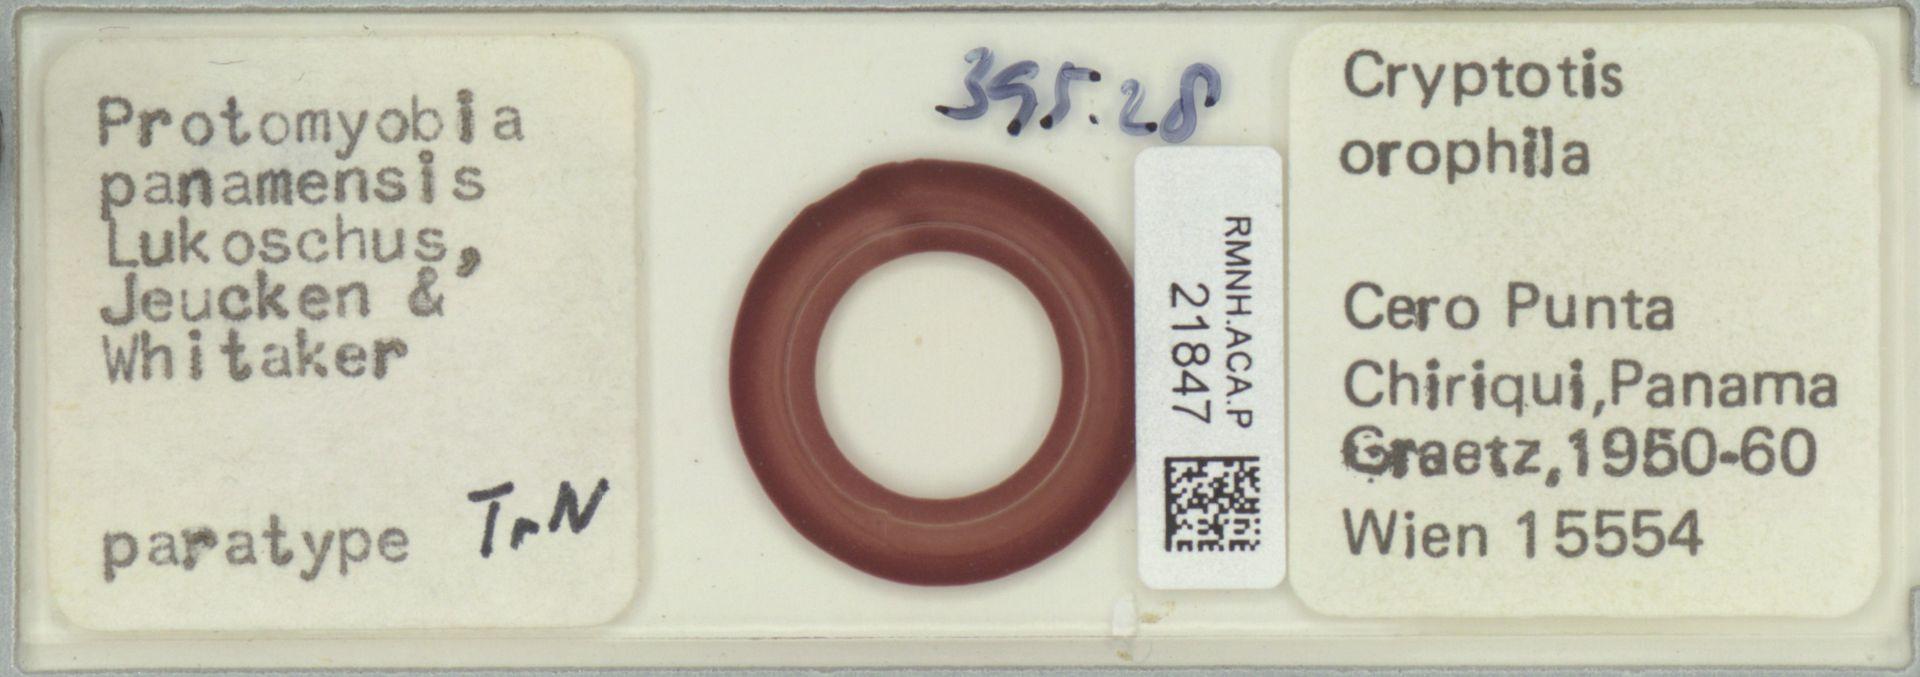 RMNH.ACA.P.21847 | Protomyobia panamensis Lukoschus, Jeucken & Whitaker